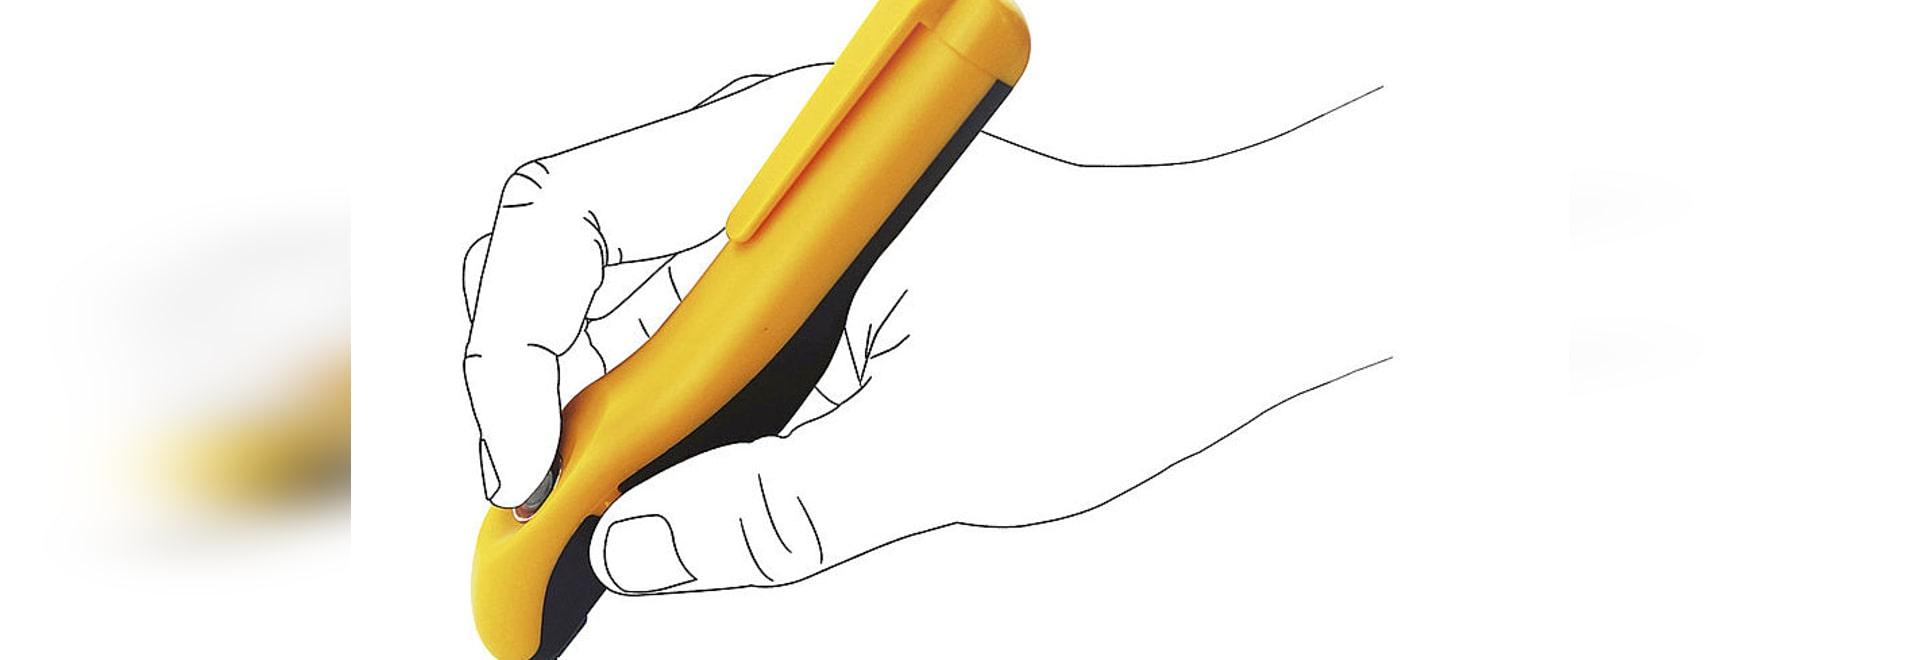 NEW: Single Channel Pen-type Oscilloscope from Fujian Lilliput Optoelectronics Technology Co., Ltd